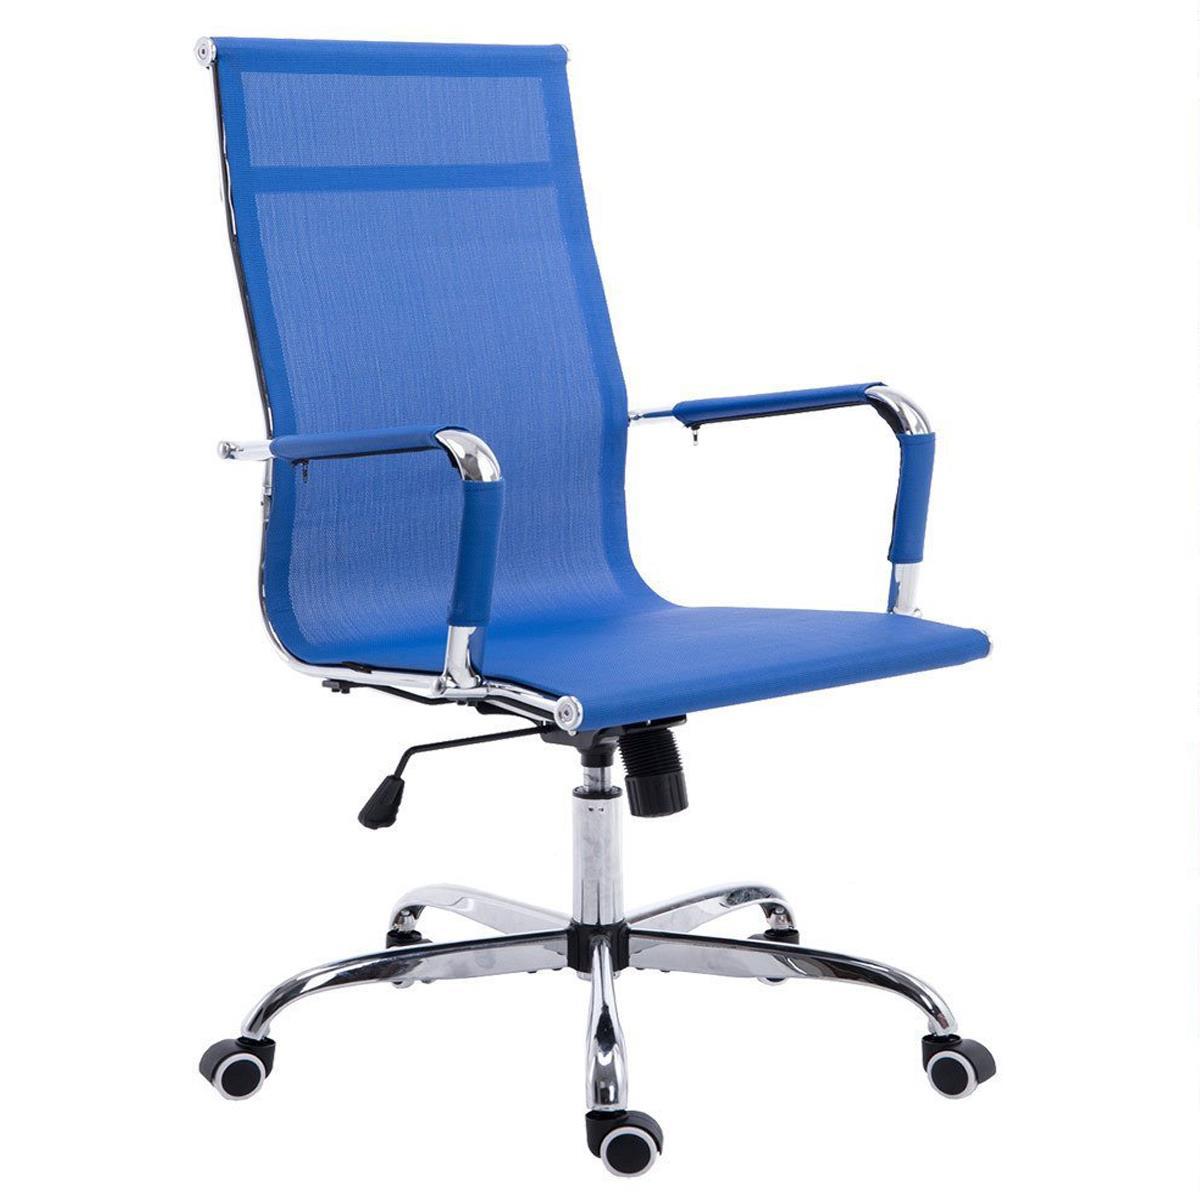 Silla de oficina italica en color azul silla de oficina for Sillas de oficina de diseno